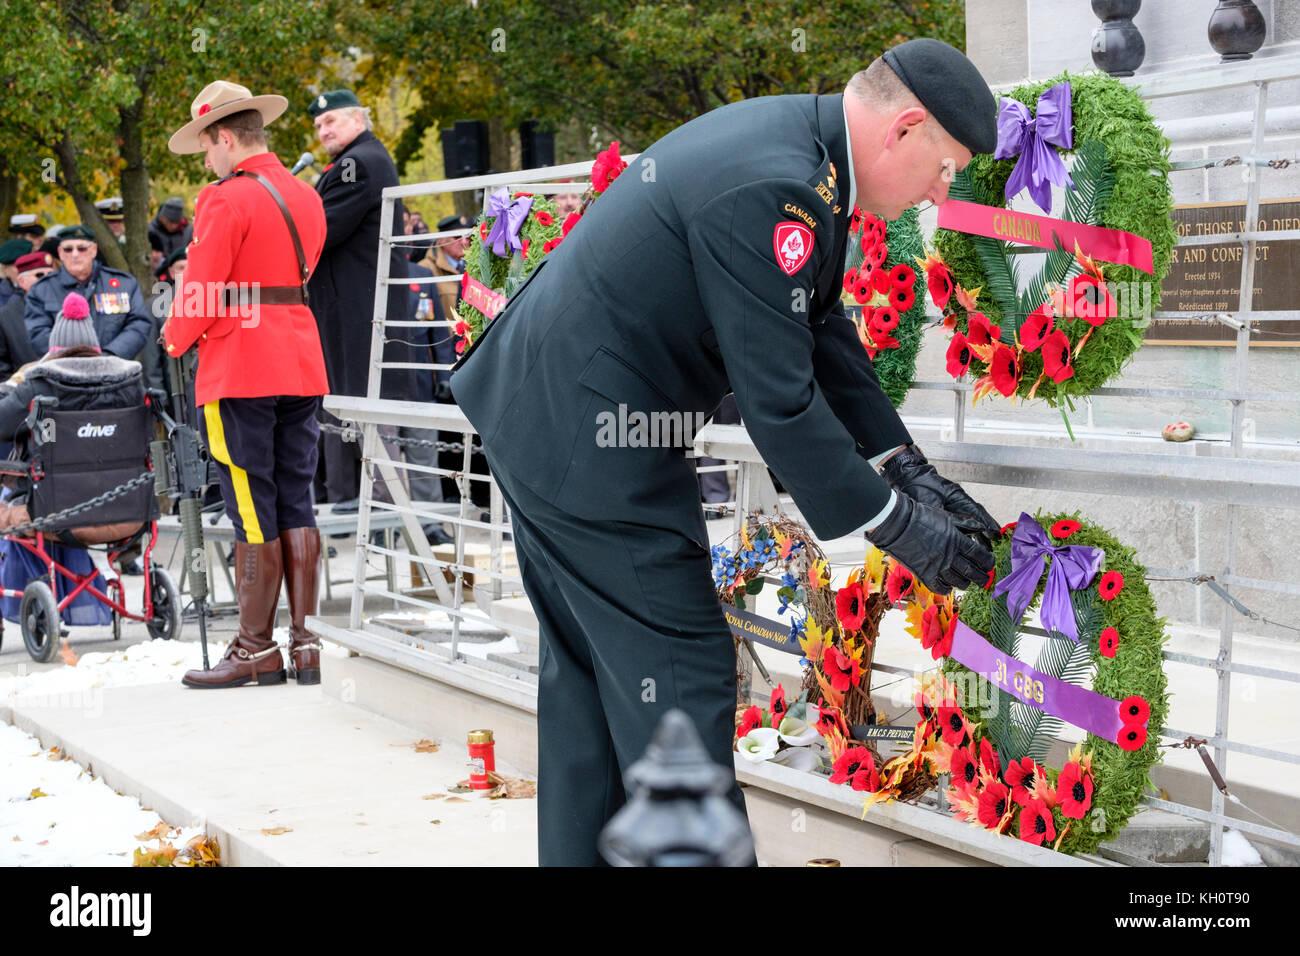 Police Regiment Stockfotos & Police Regiment Bilder - Alamy